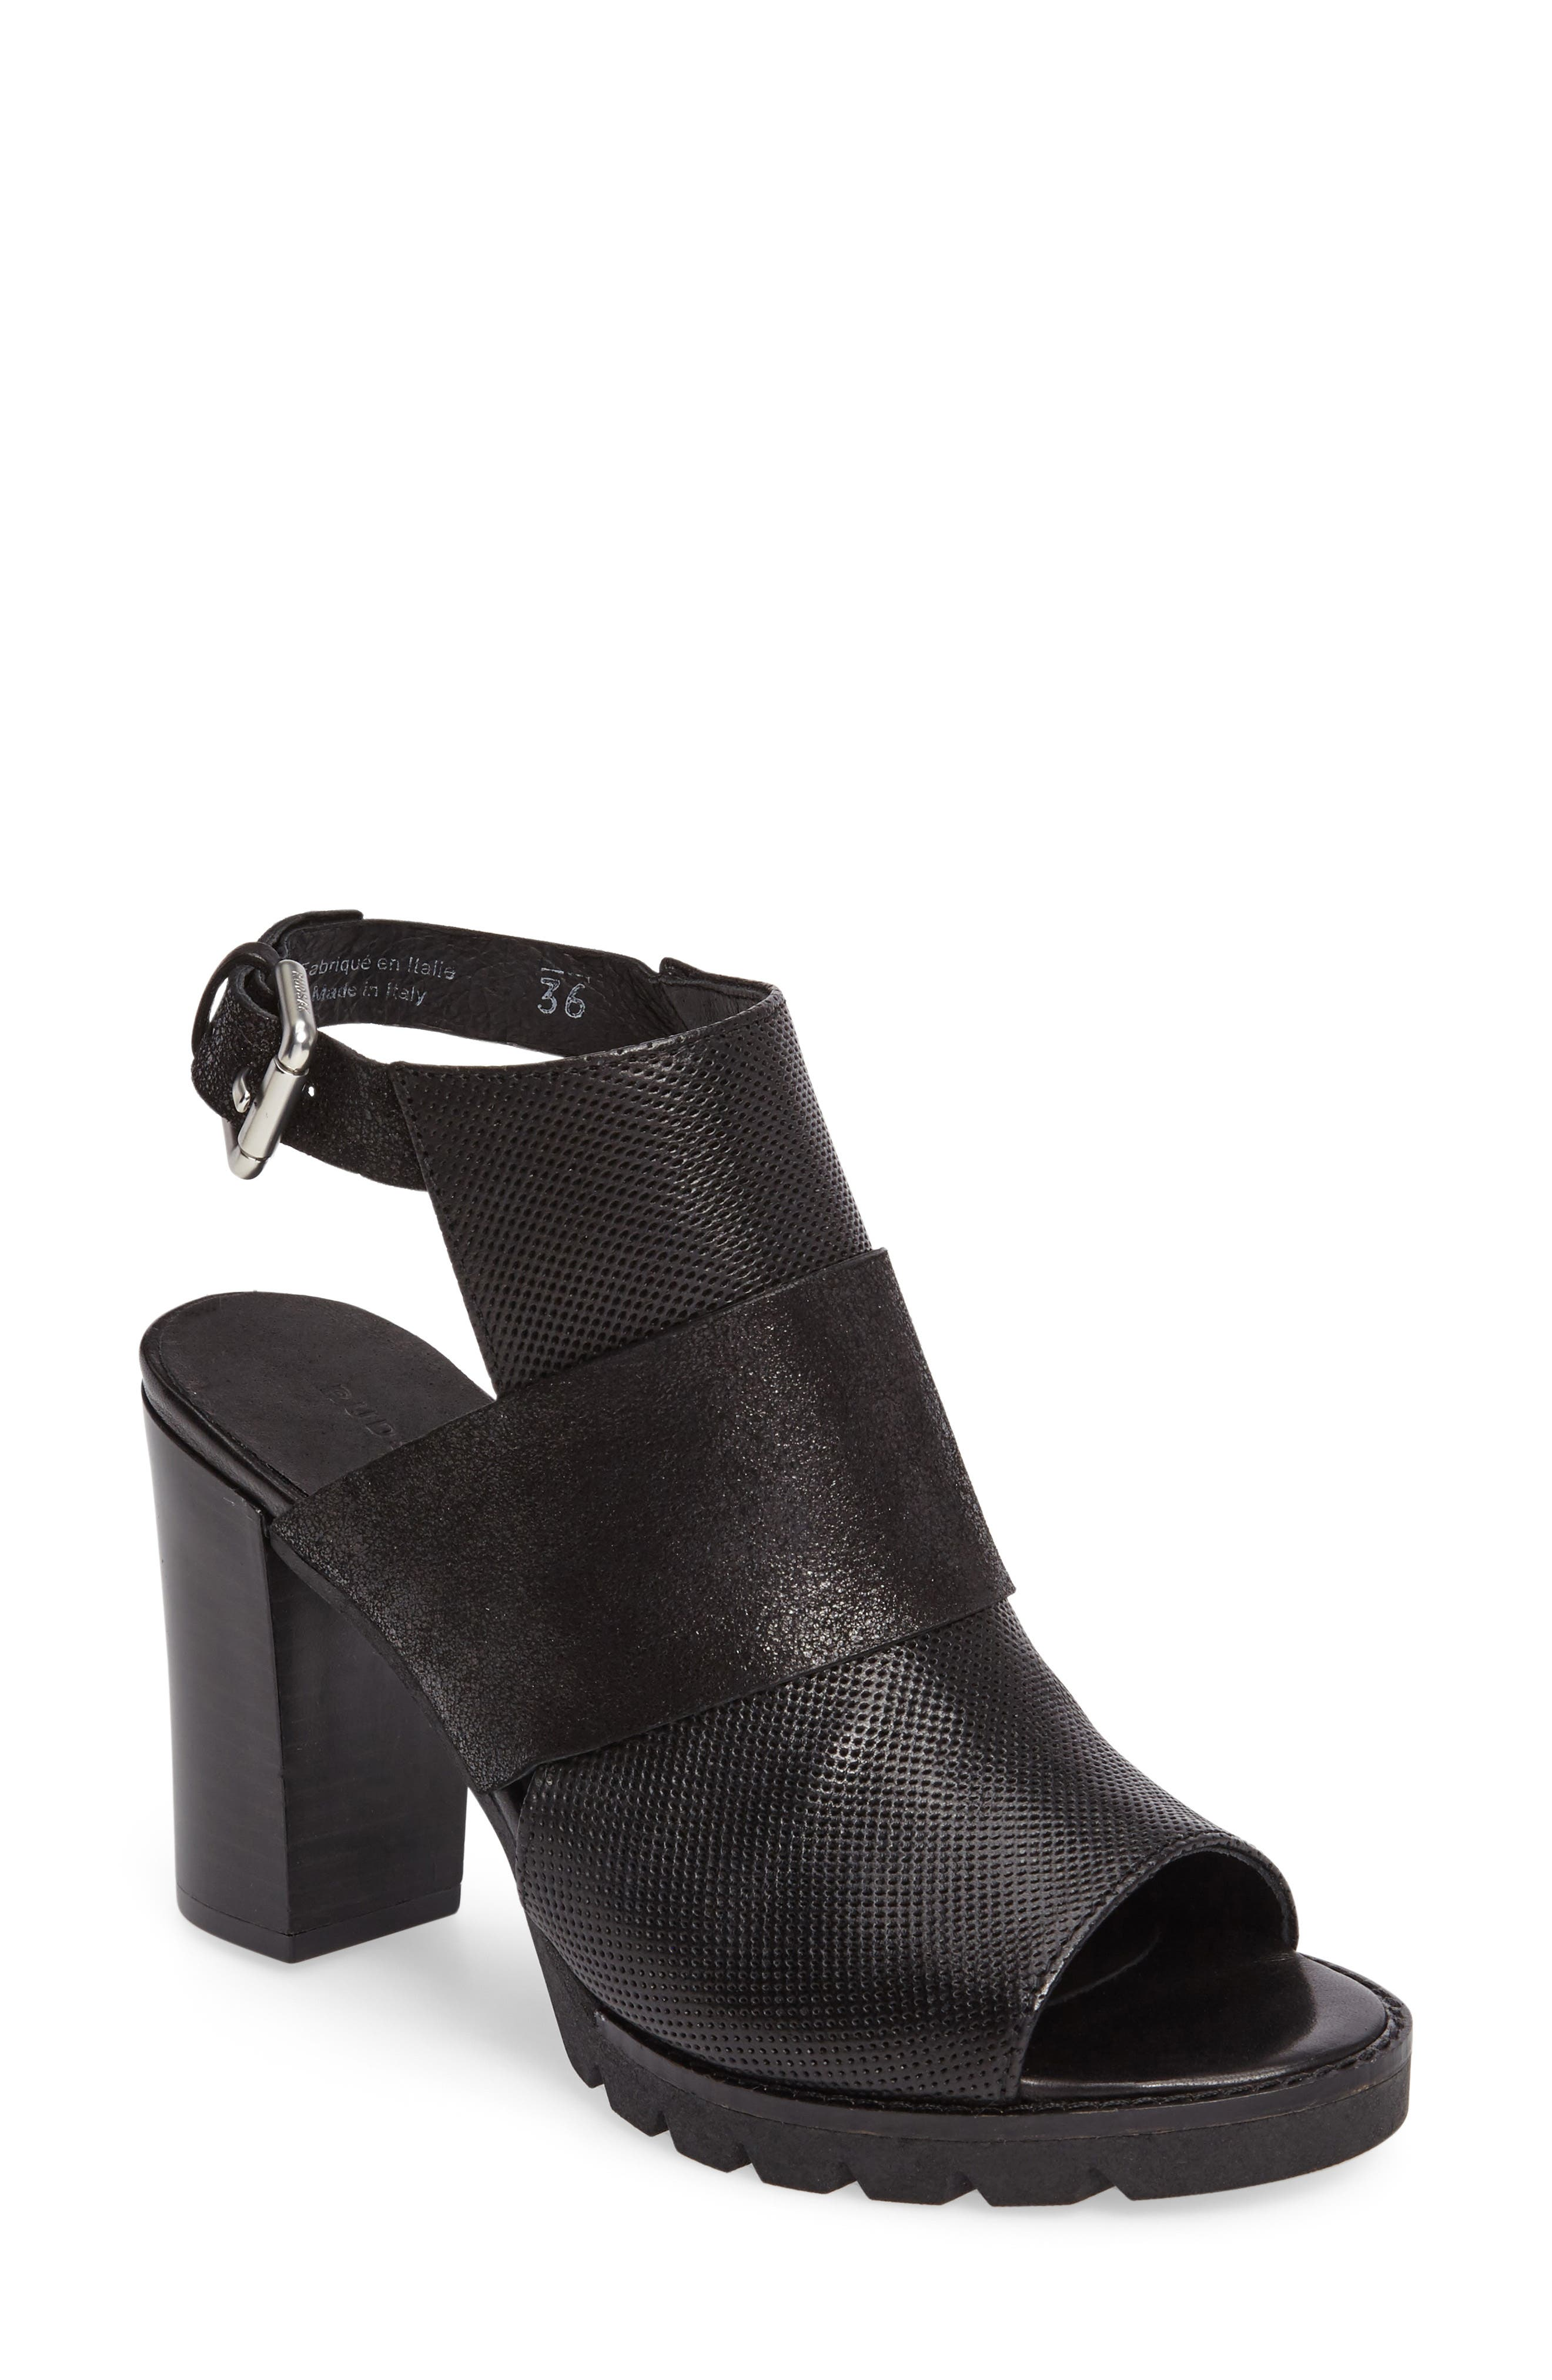 Brittni Block Heel Sandal,                             Main thumbnail 1, color,                             001